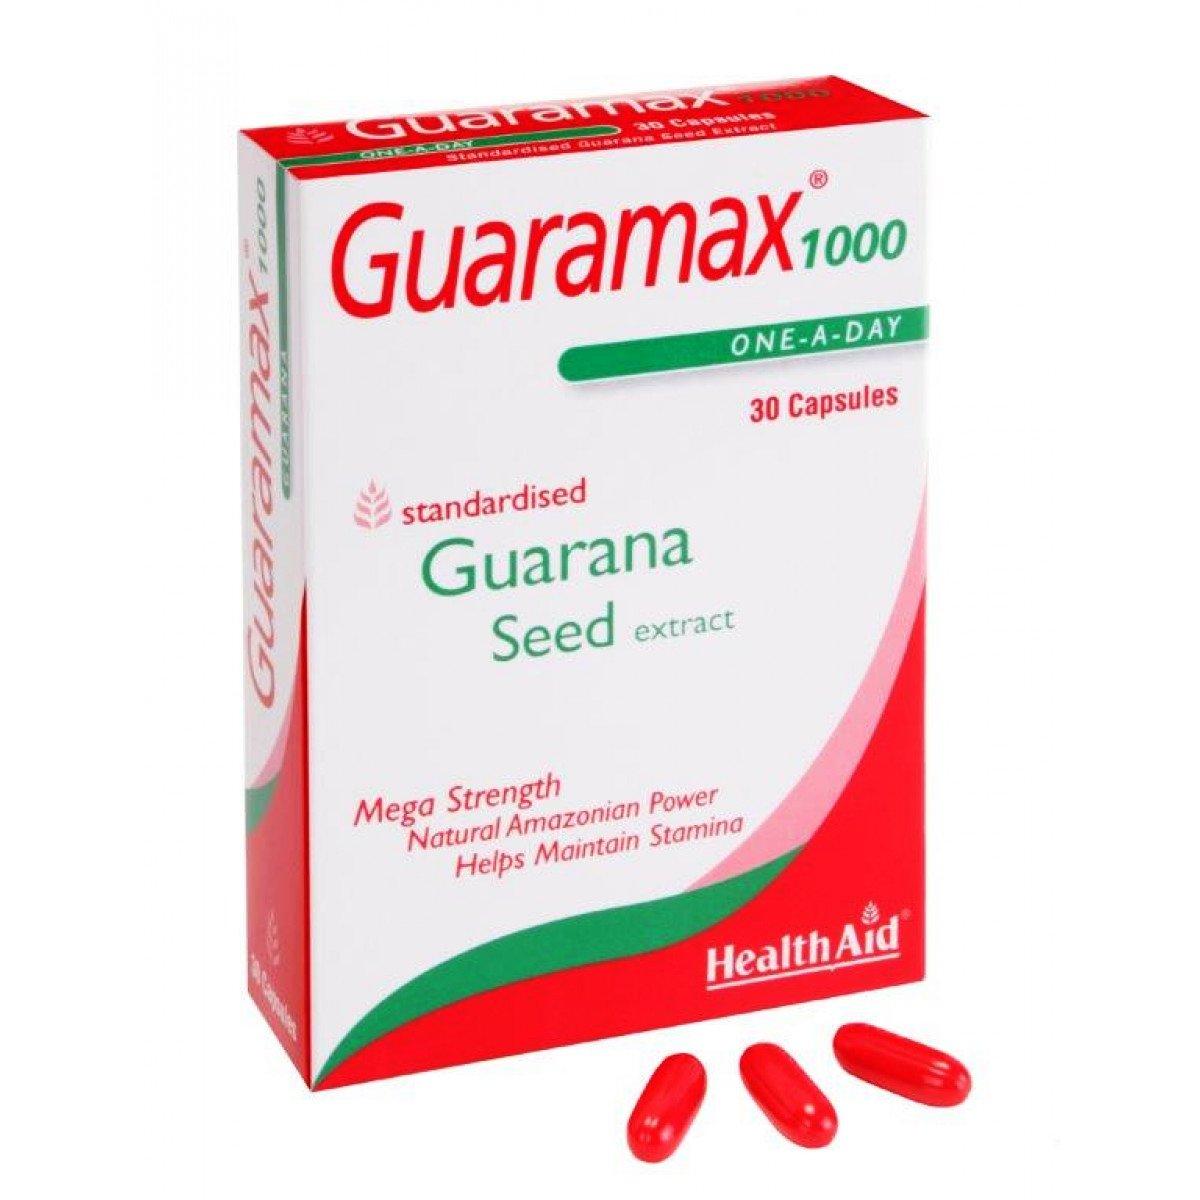 Health Aid Guaramax 1000 Φυσικές Τονωτικές και Αναζωογονητικές του Ιδιότητες 30caps